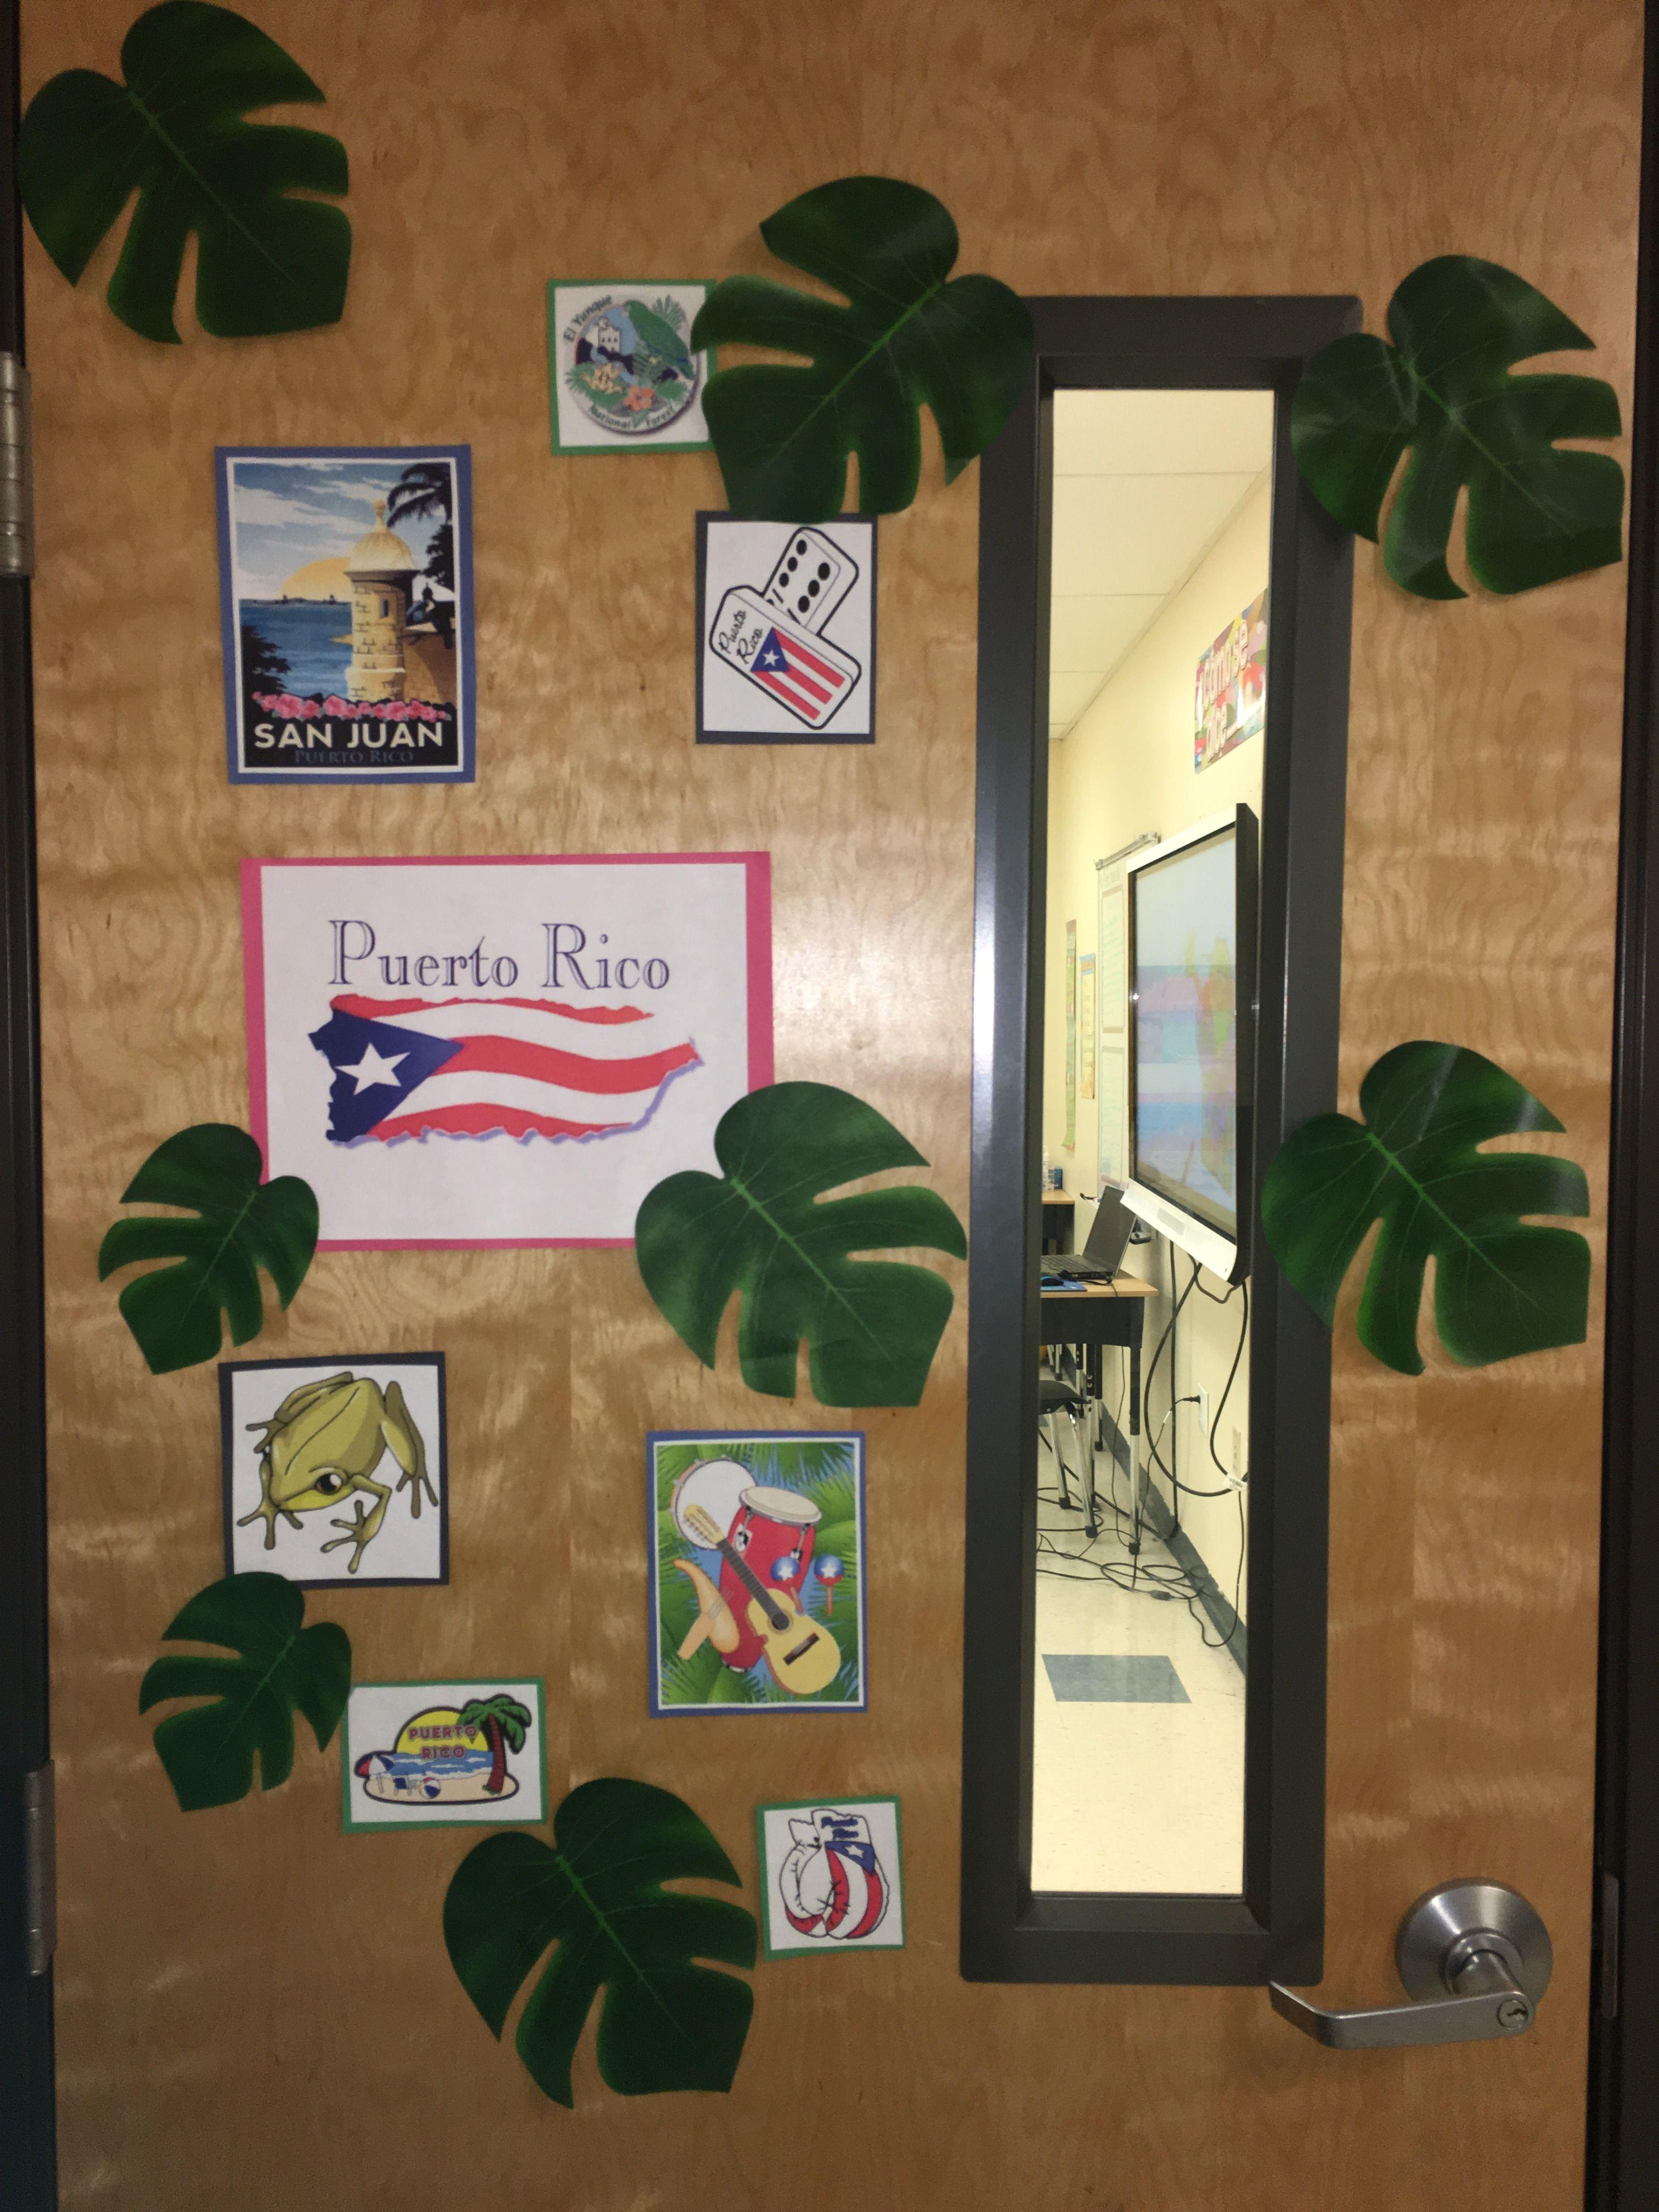 Puerto Rico Classroom Door Decoration Idea  Products I -3258